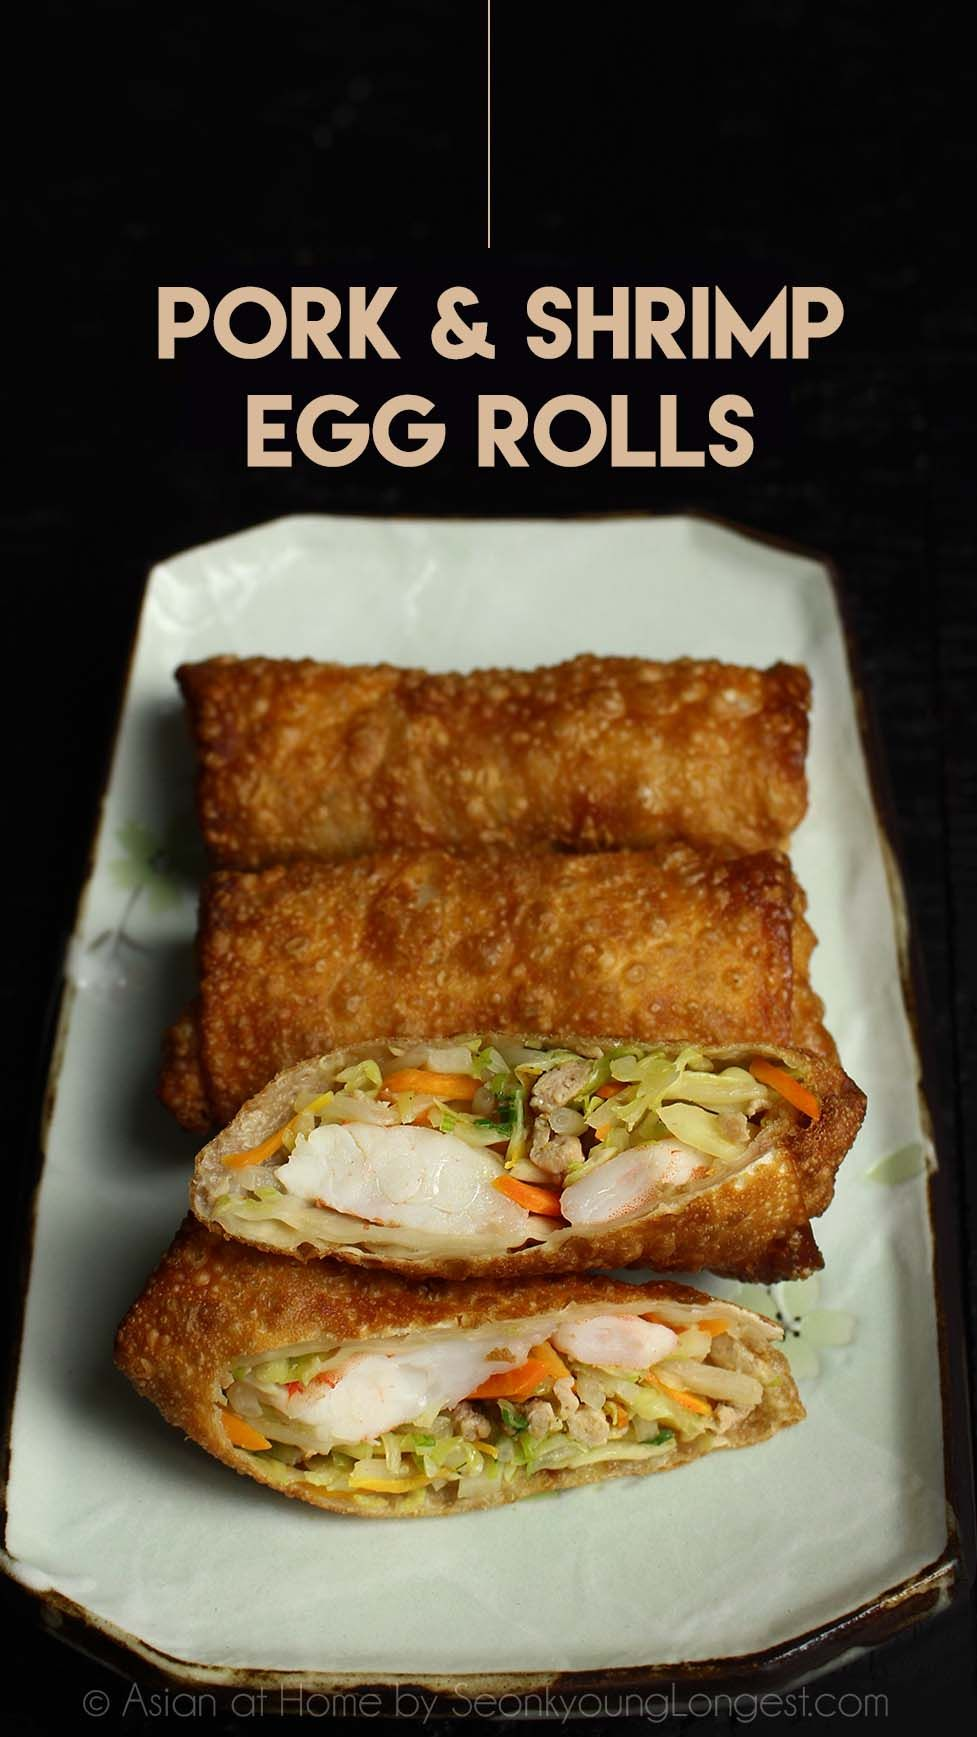 Small Crop Of Shrimp Egg Rolls